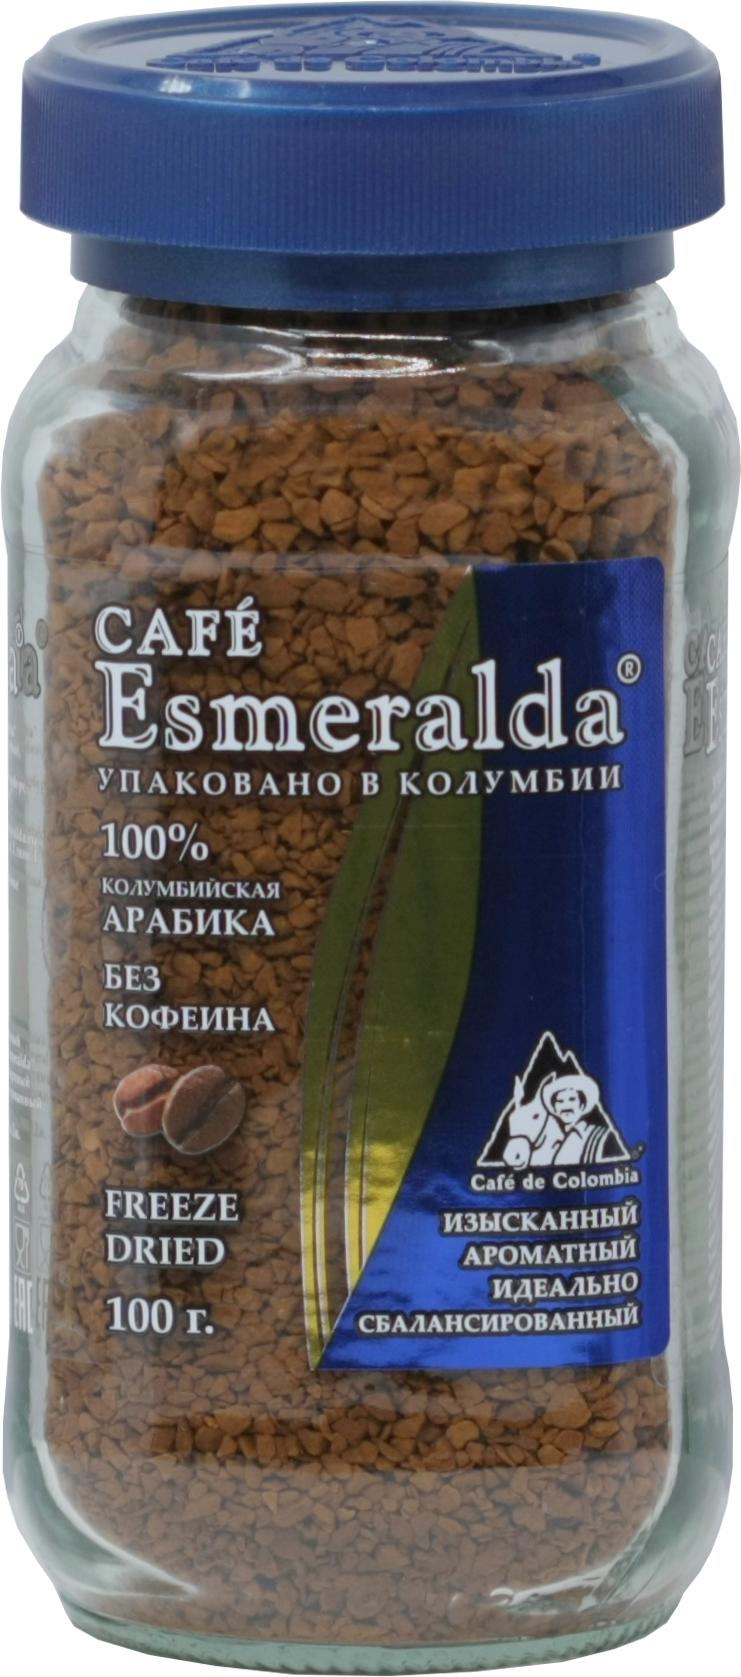 Cafe Esmeralda. Cafe Esmeralda без кофеина 100 гр. стекл.банка